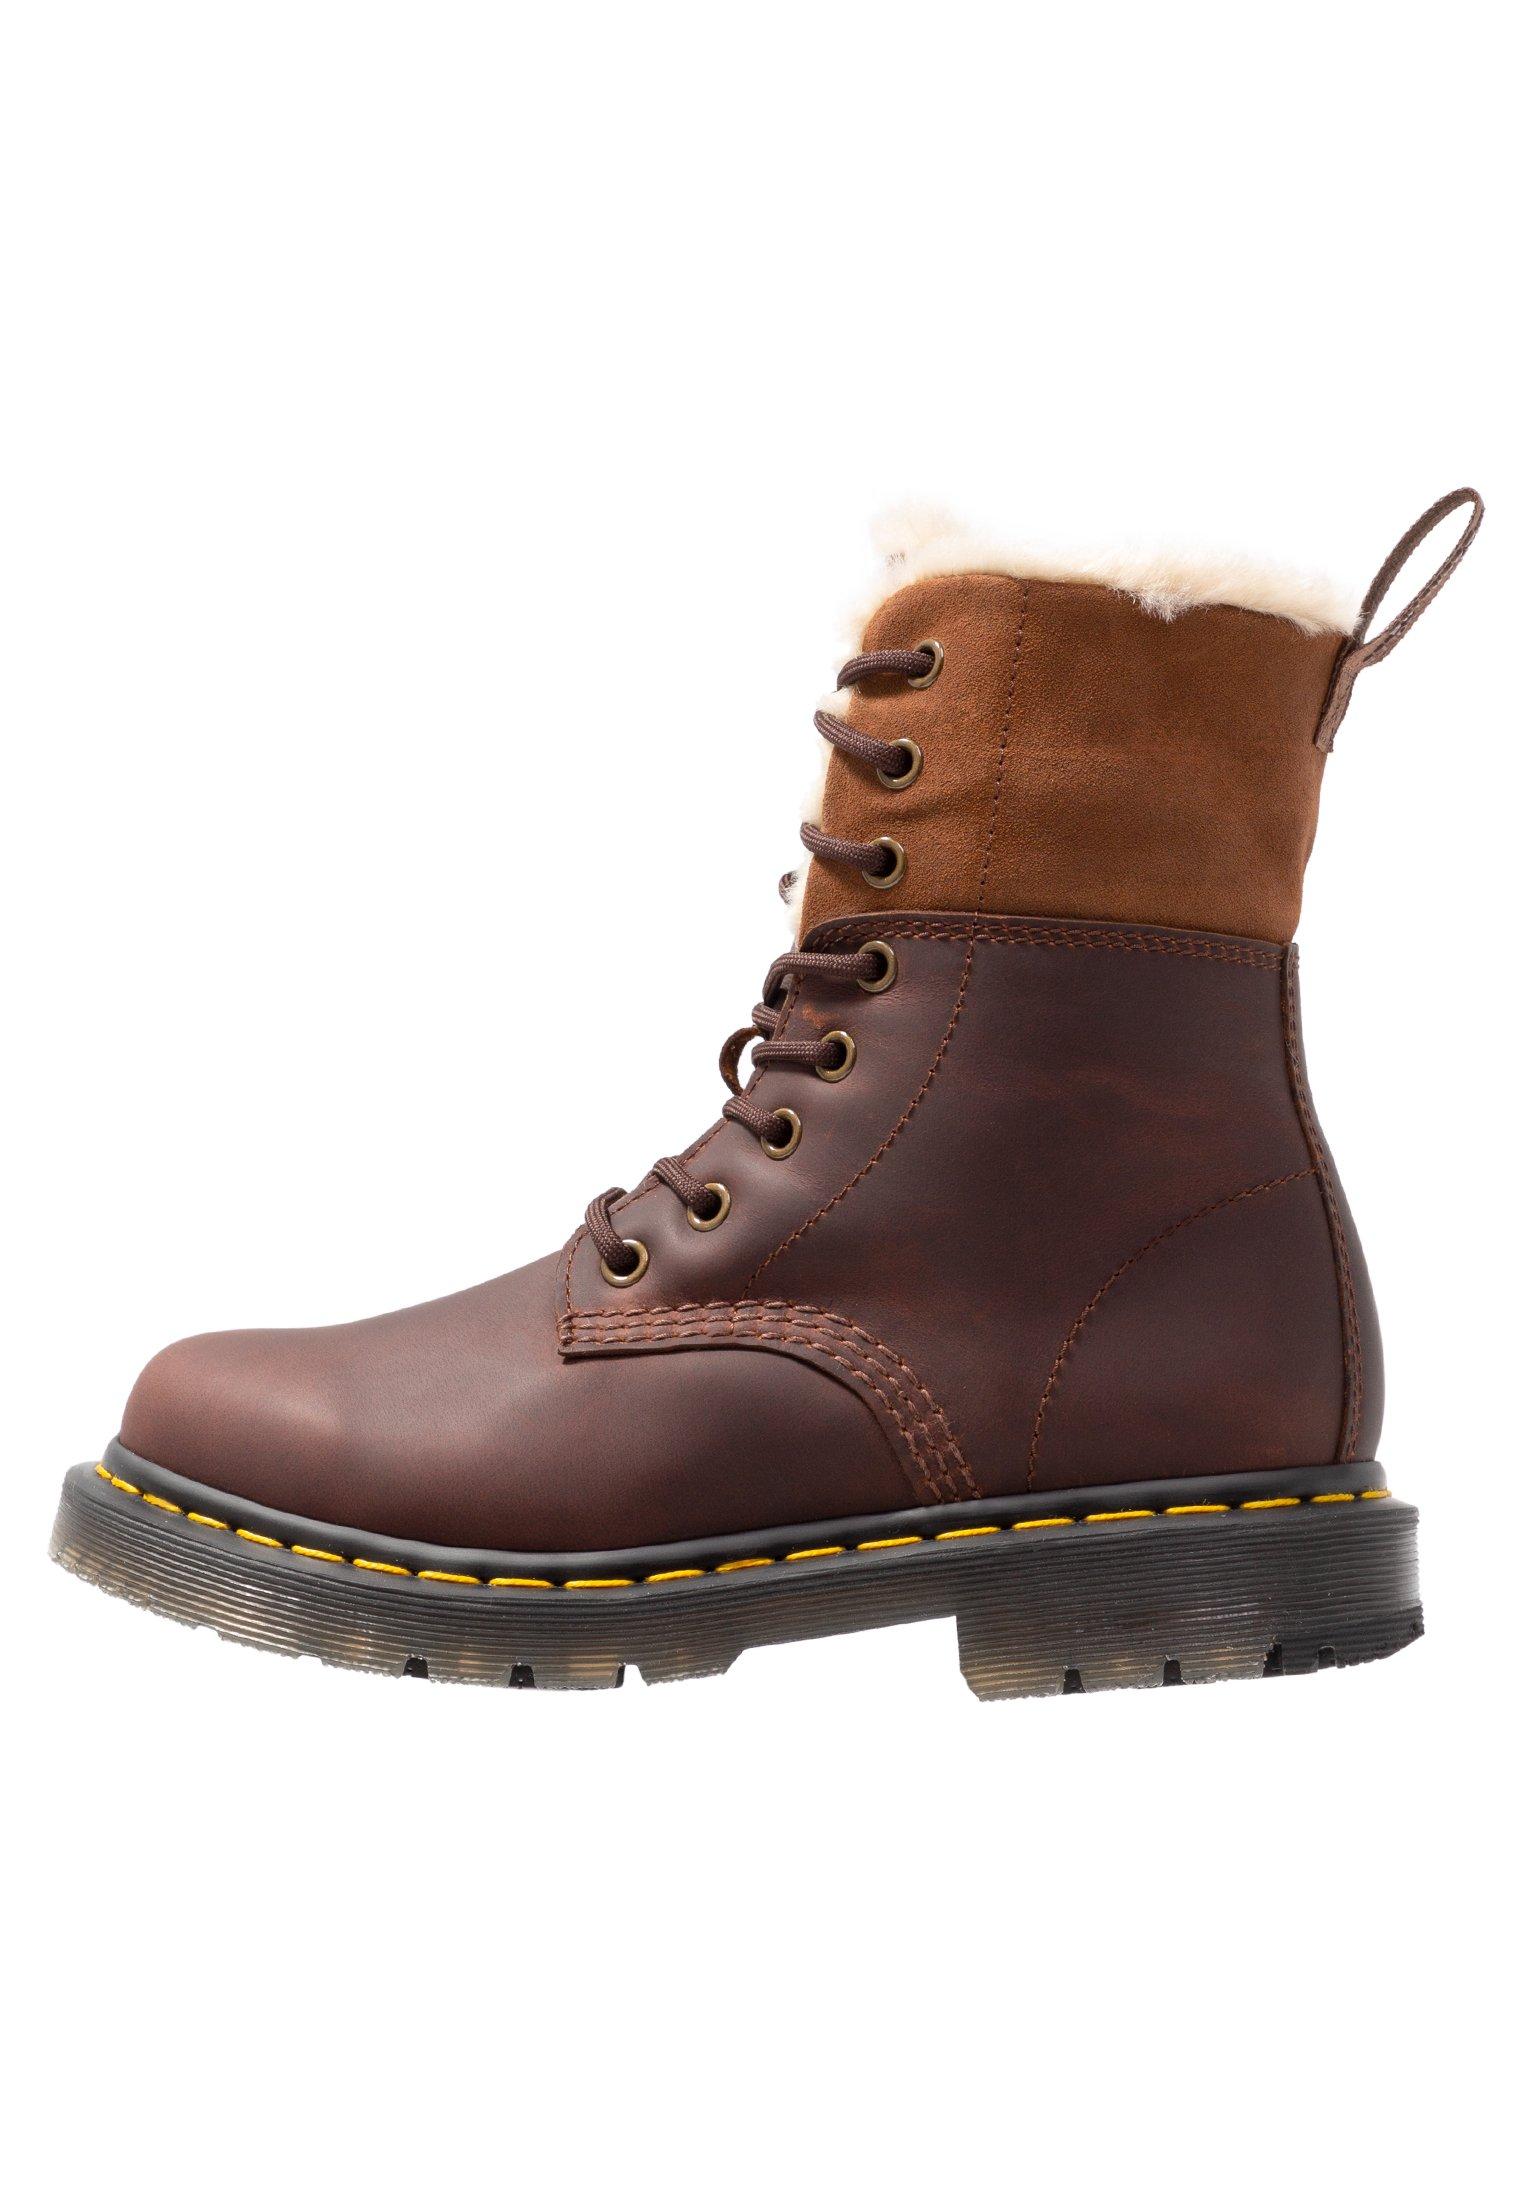 1460 Kolbert Snowplow Boots Dark Brown